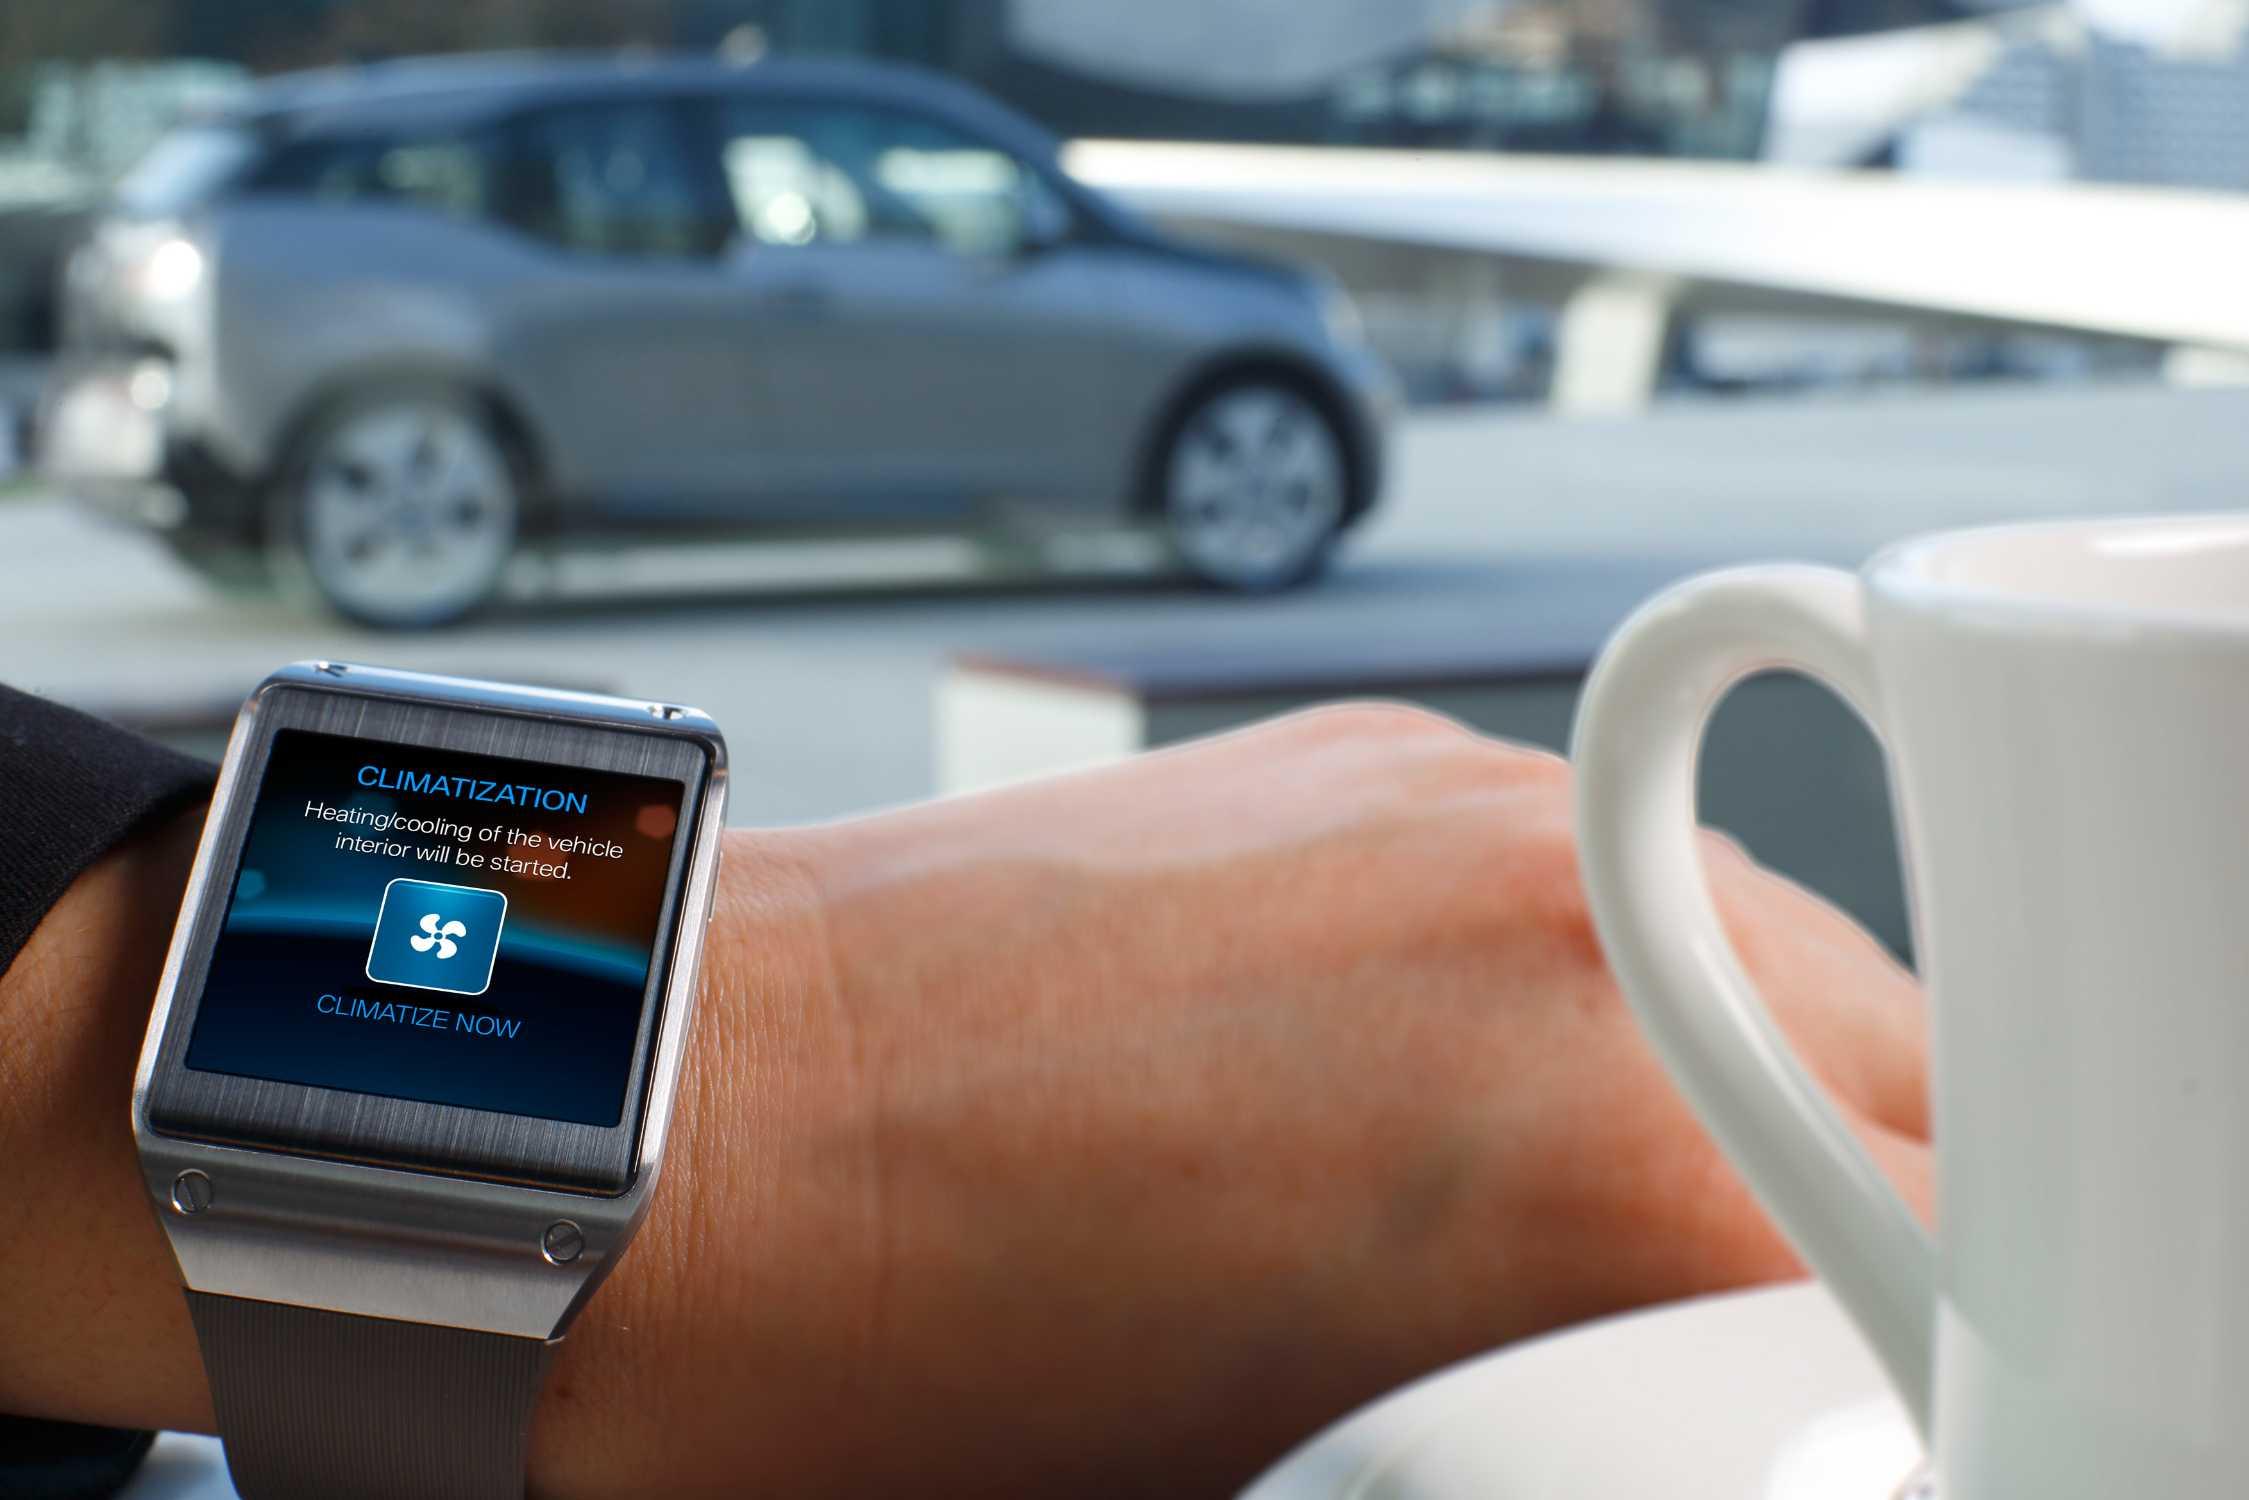 BMW i Remote App – now offering BMW i3 info through the